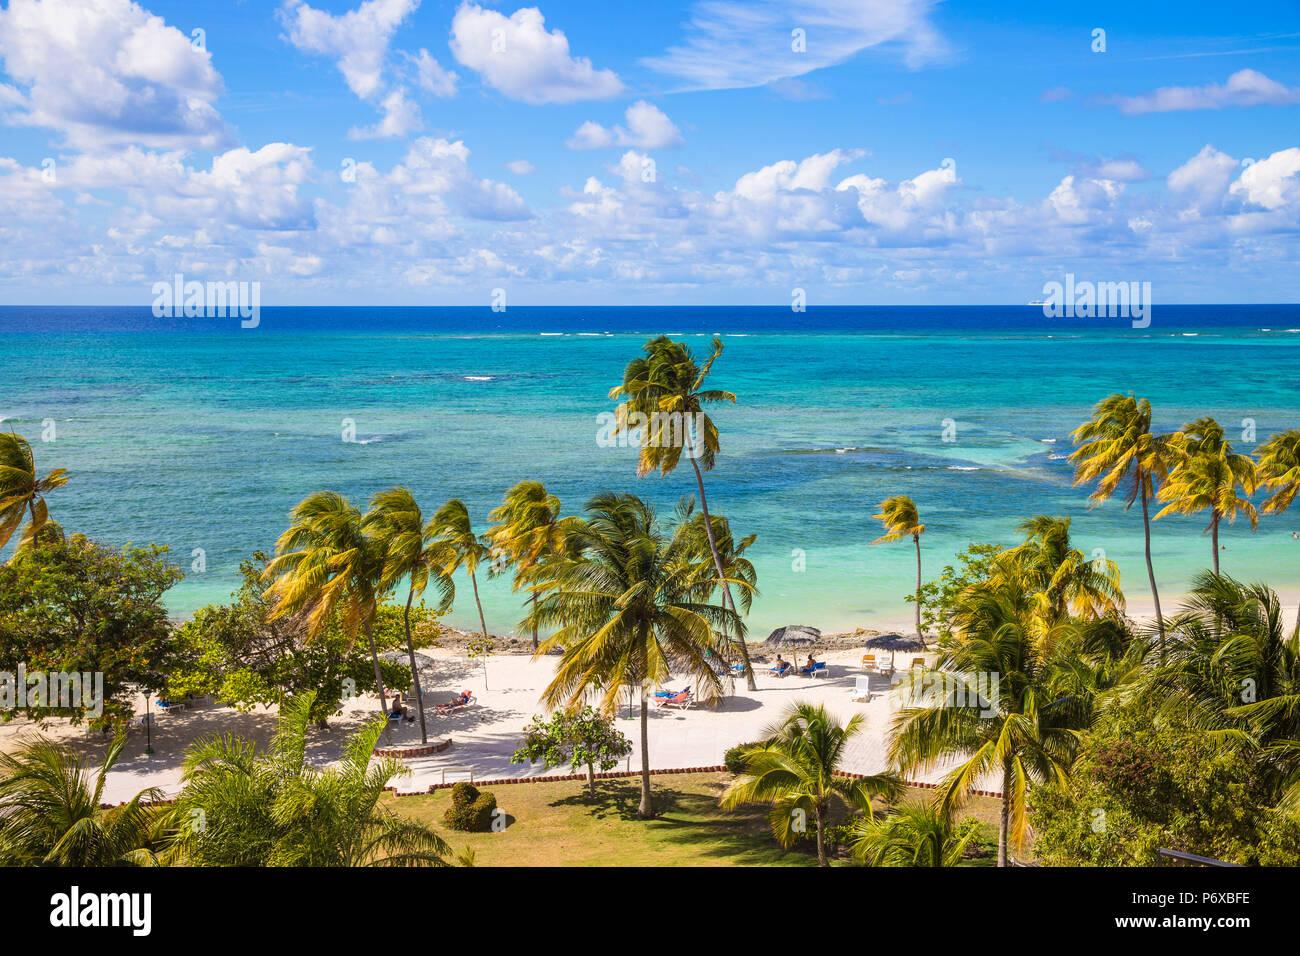 Kuba, Holguin Provinz, Playa Guardalvaca Stockbild